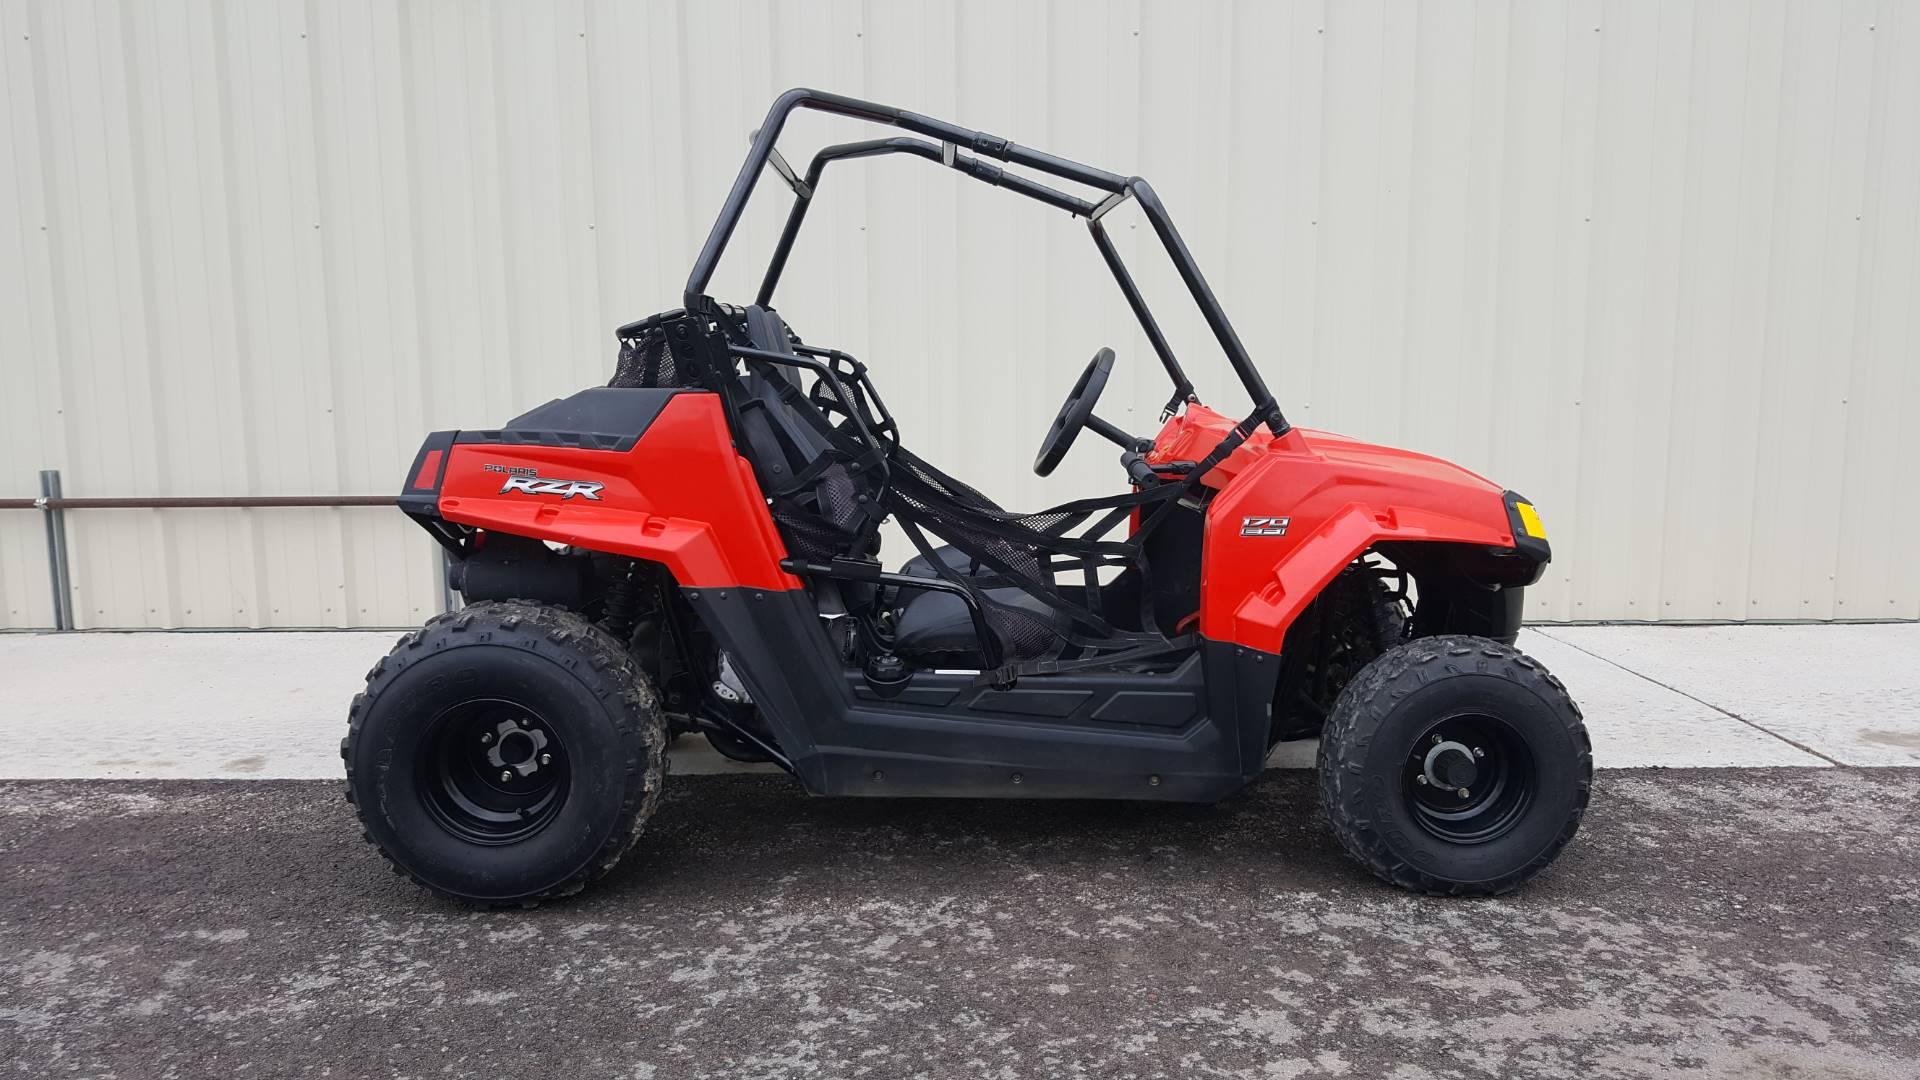 2015 Polaris RZR 170 EFI for sale 158392